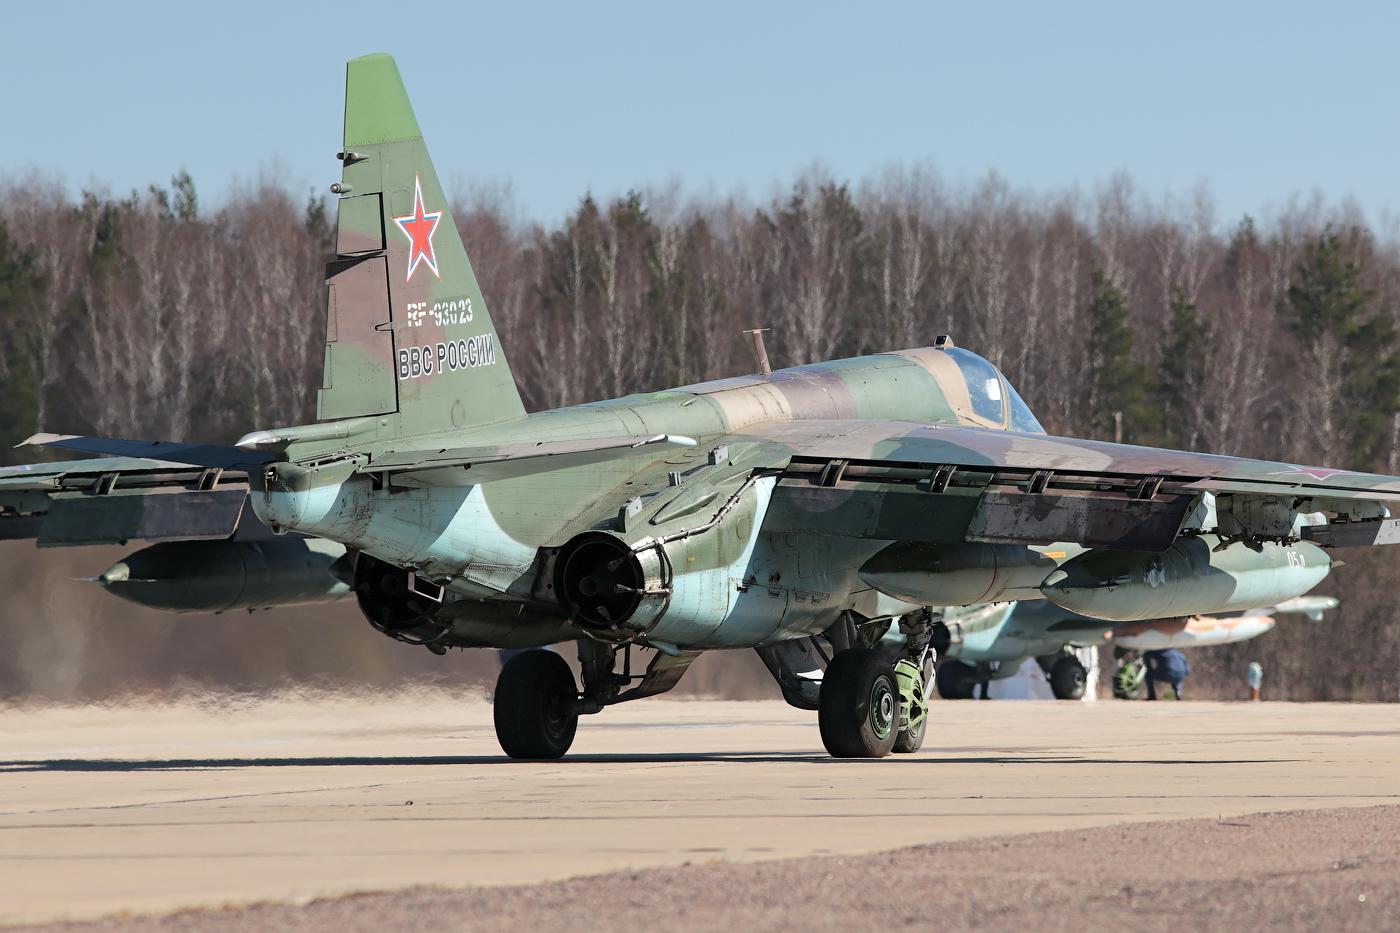 Sukhoi Su-25 Frogfoot - Page 3 0_b8733_21a9d10a_orig